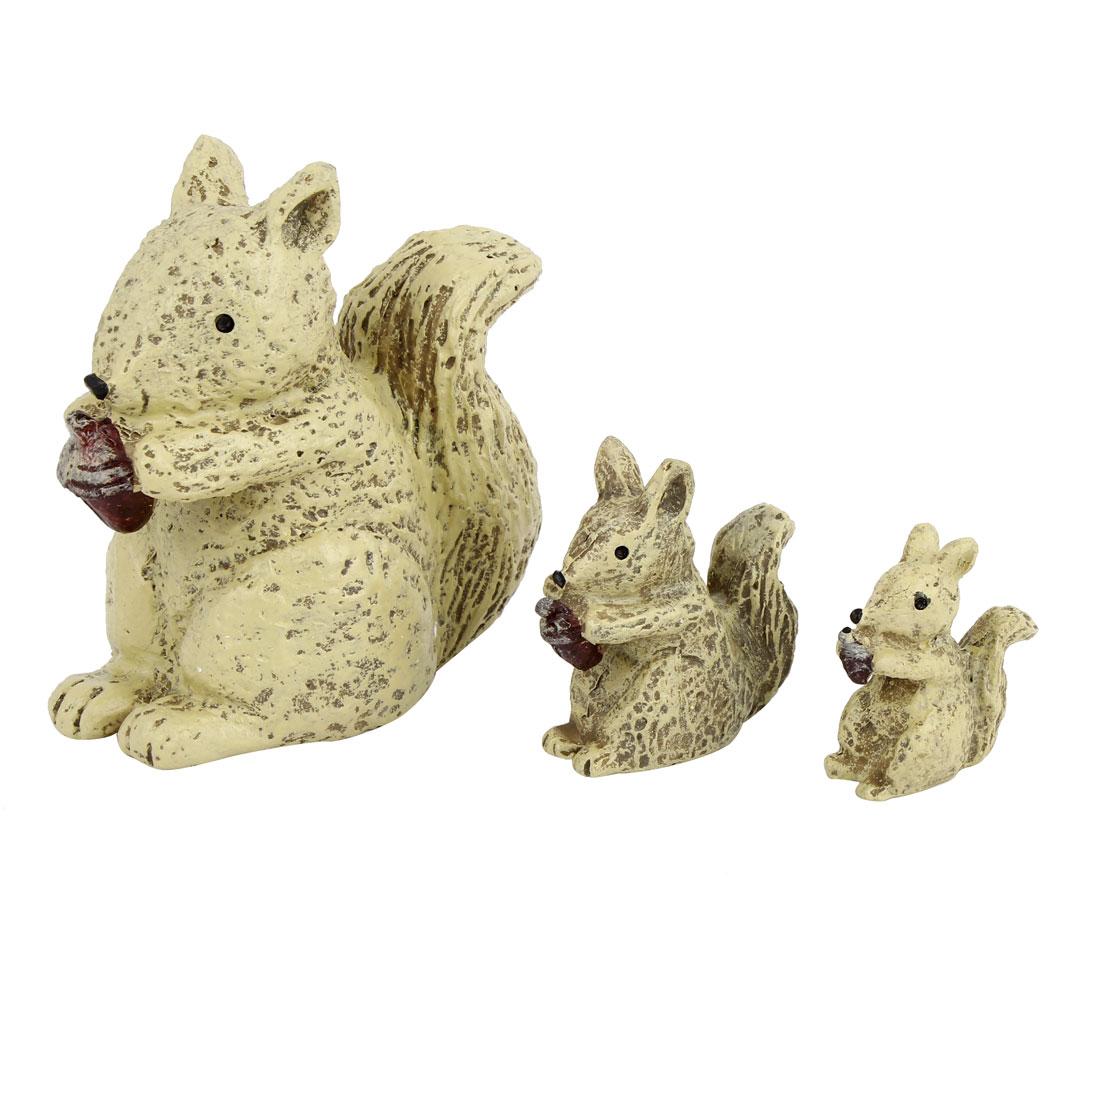 3 in 1 Tabletop Adorn Craft Squirrel Ornament Khaki